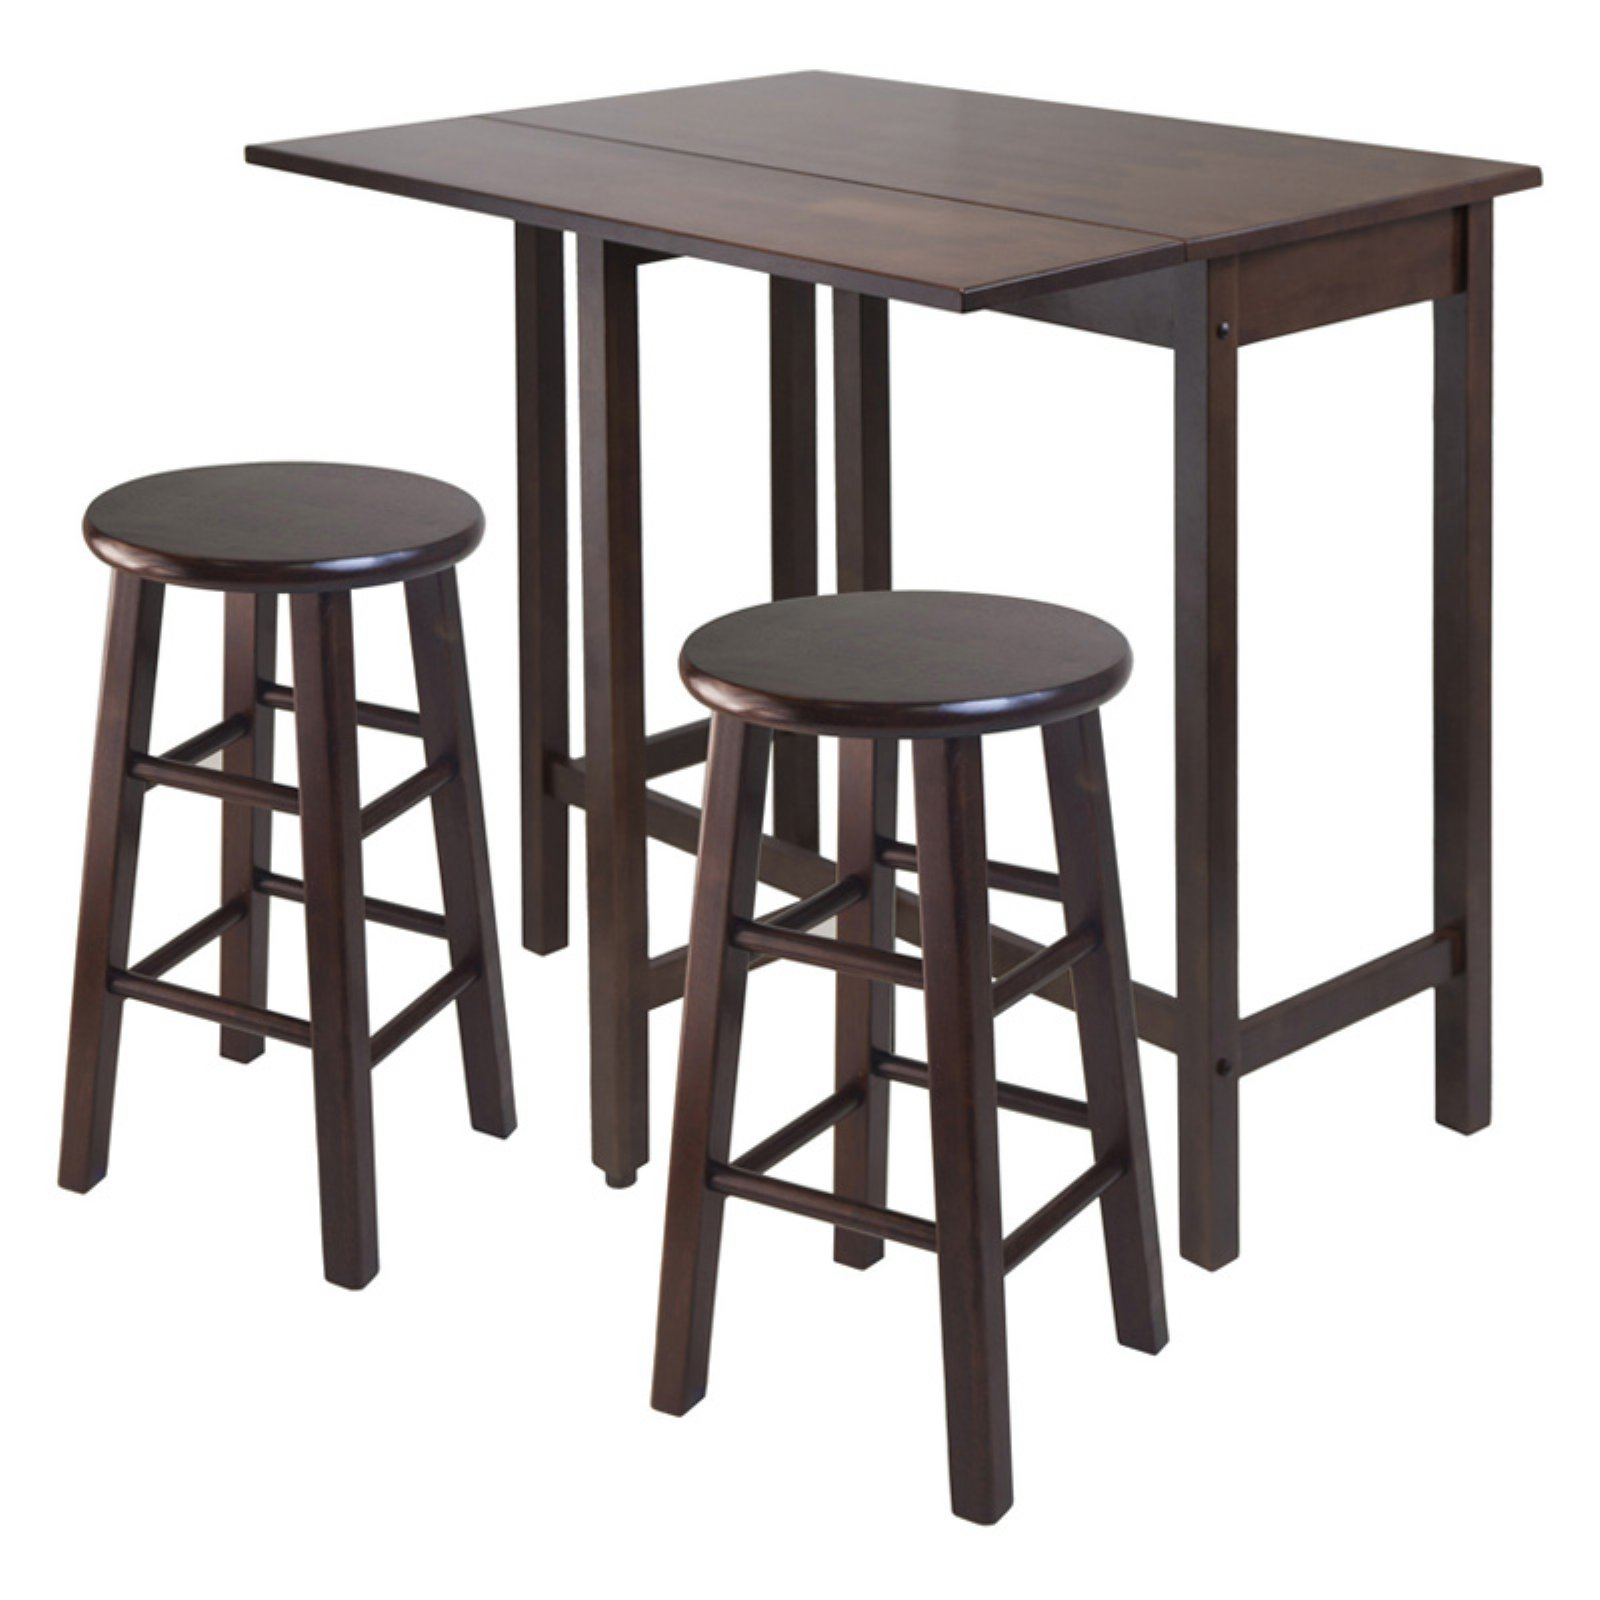 Lynnwood Drop Leaf Island Table with 2 Square Legs Stool Walnut